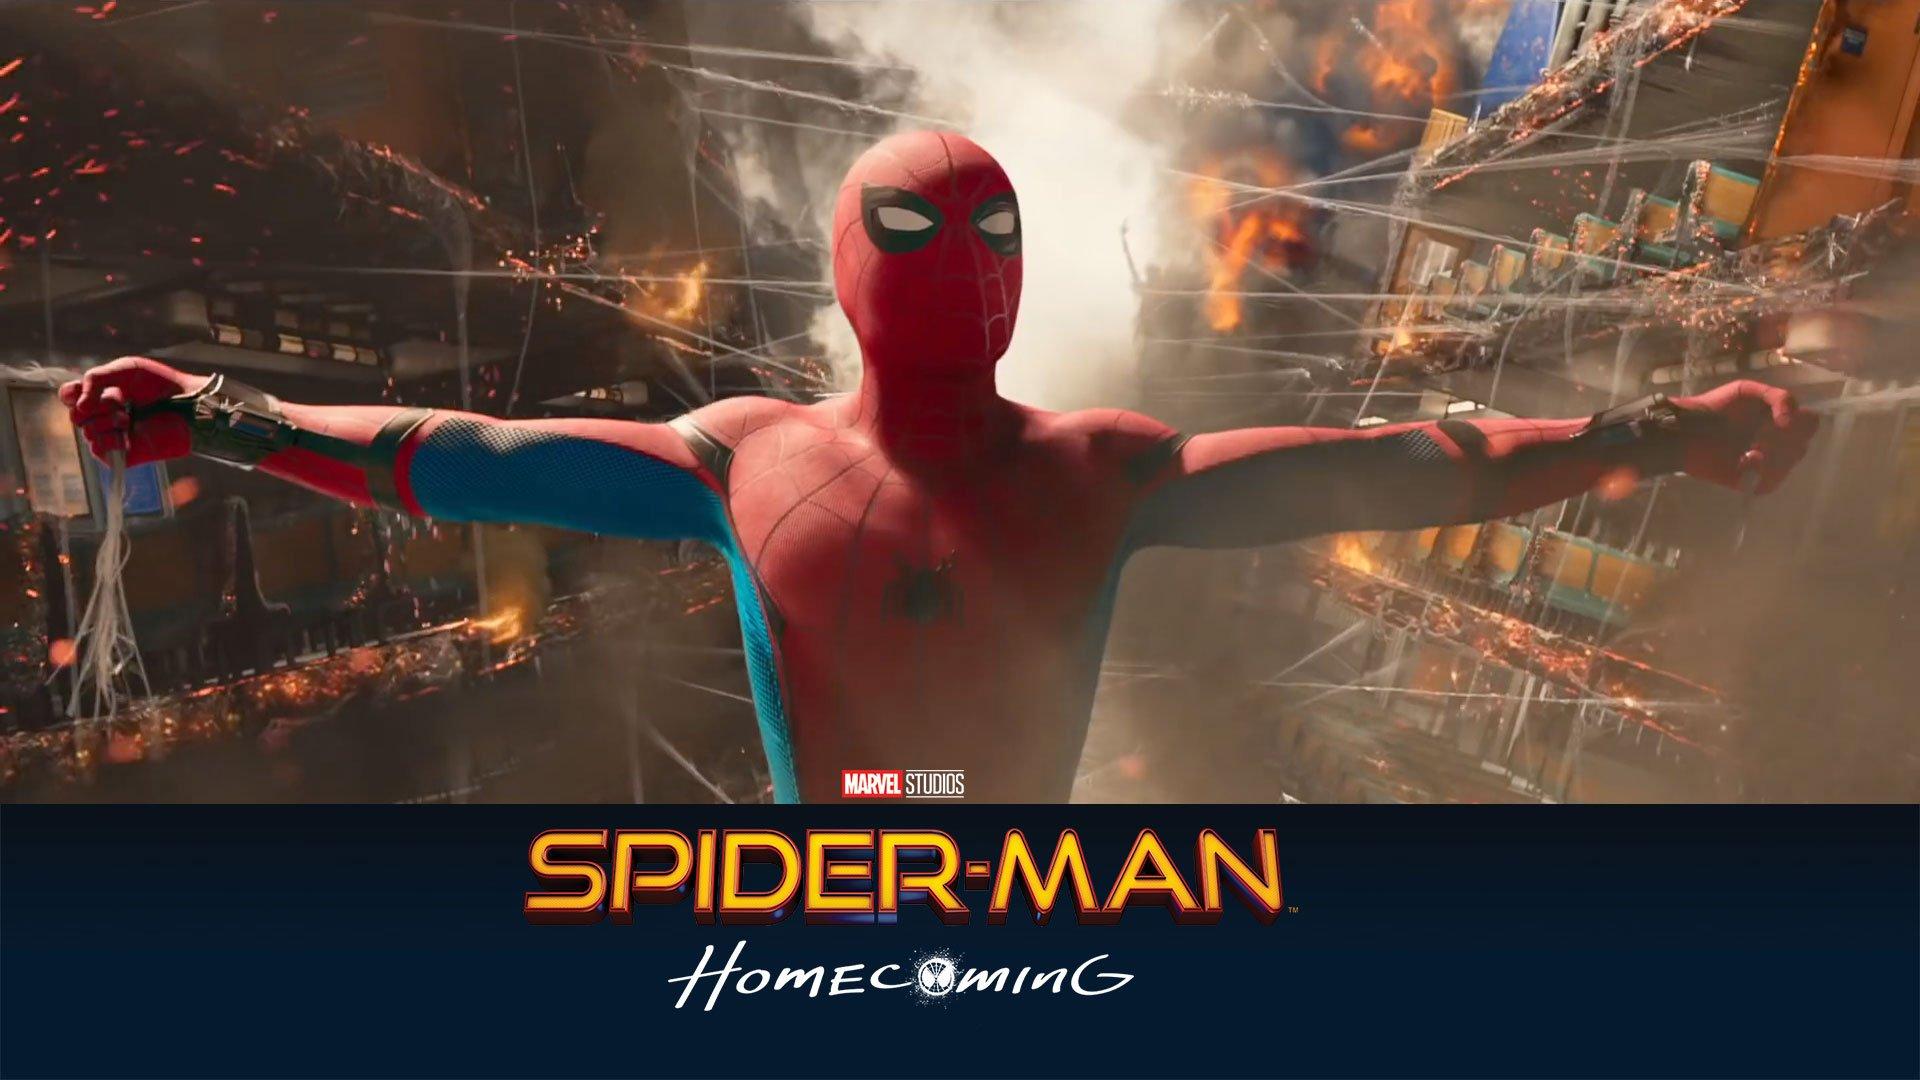 Spider Man 2017 Spider-Man: Homecoming...